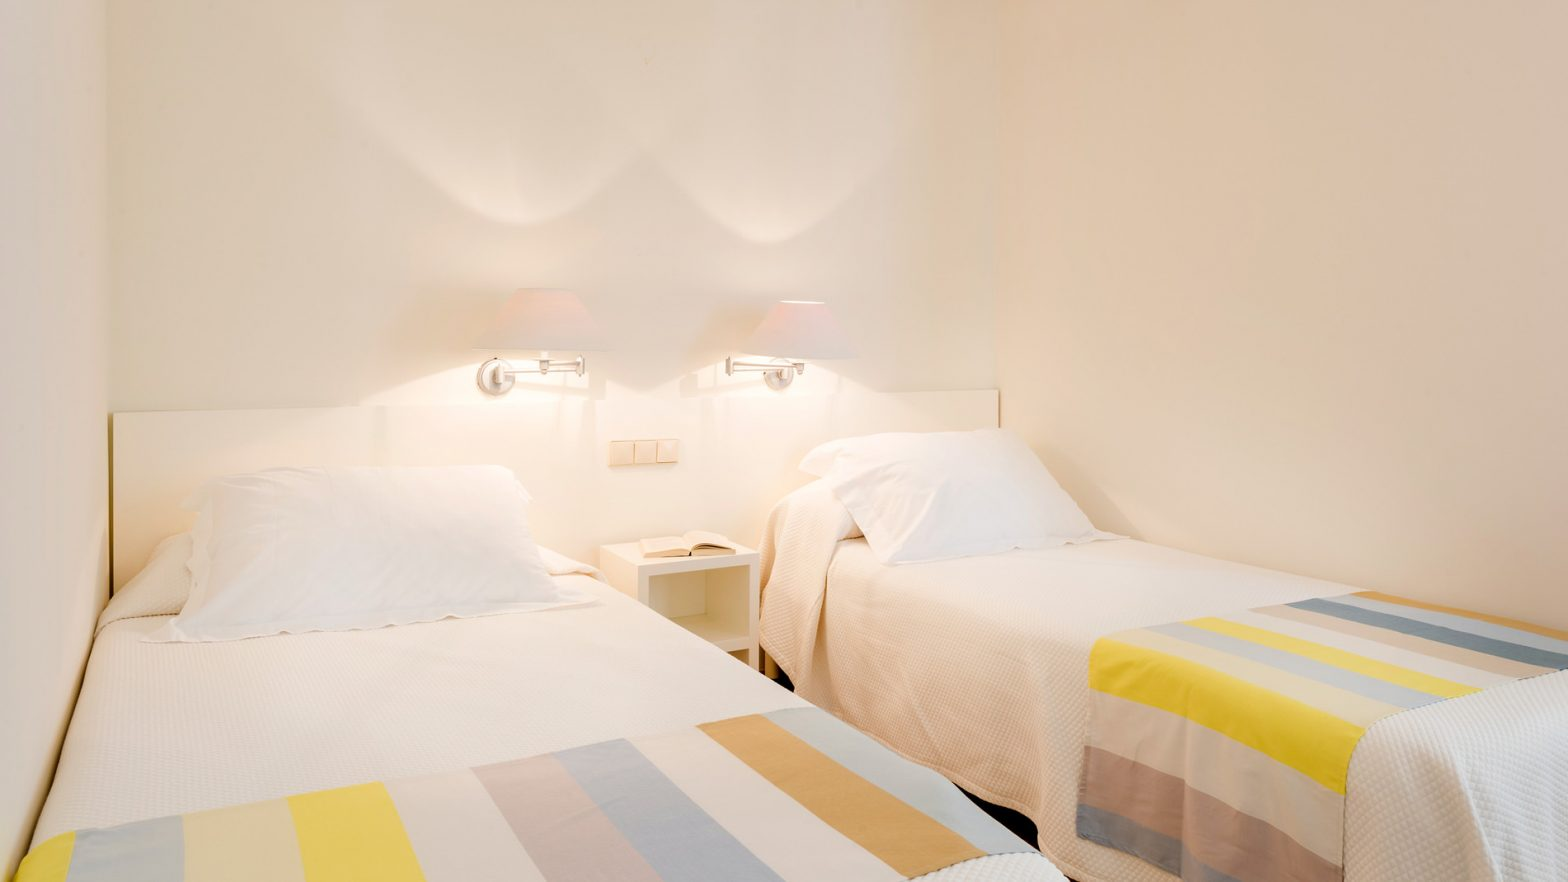 appartement_hotel_oceano_schlafen